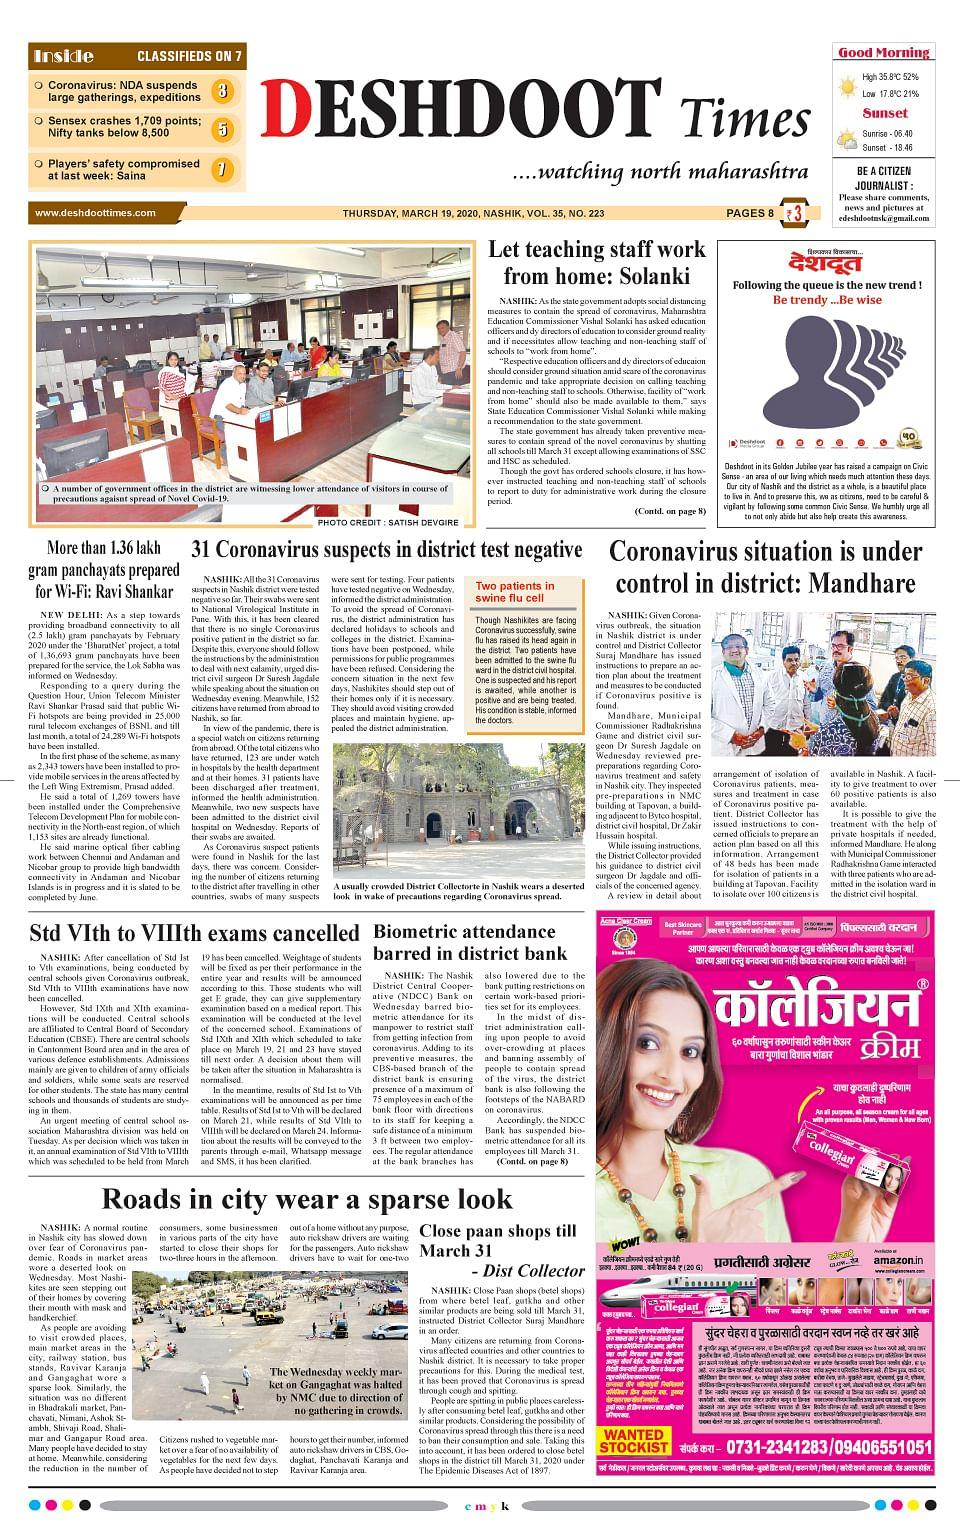 19 March 2020, Deshdoot Times E Paper, Nashik